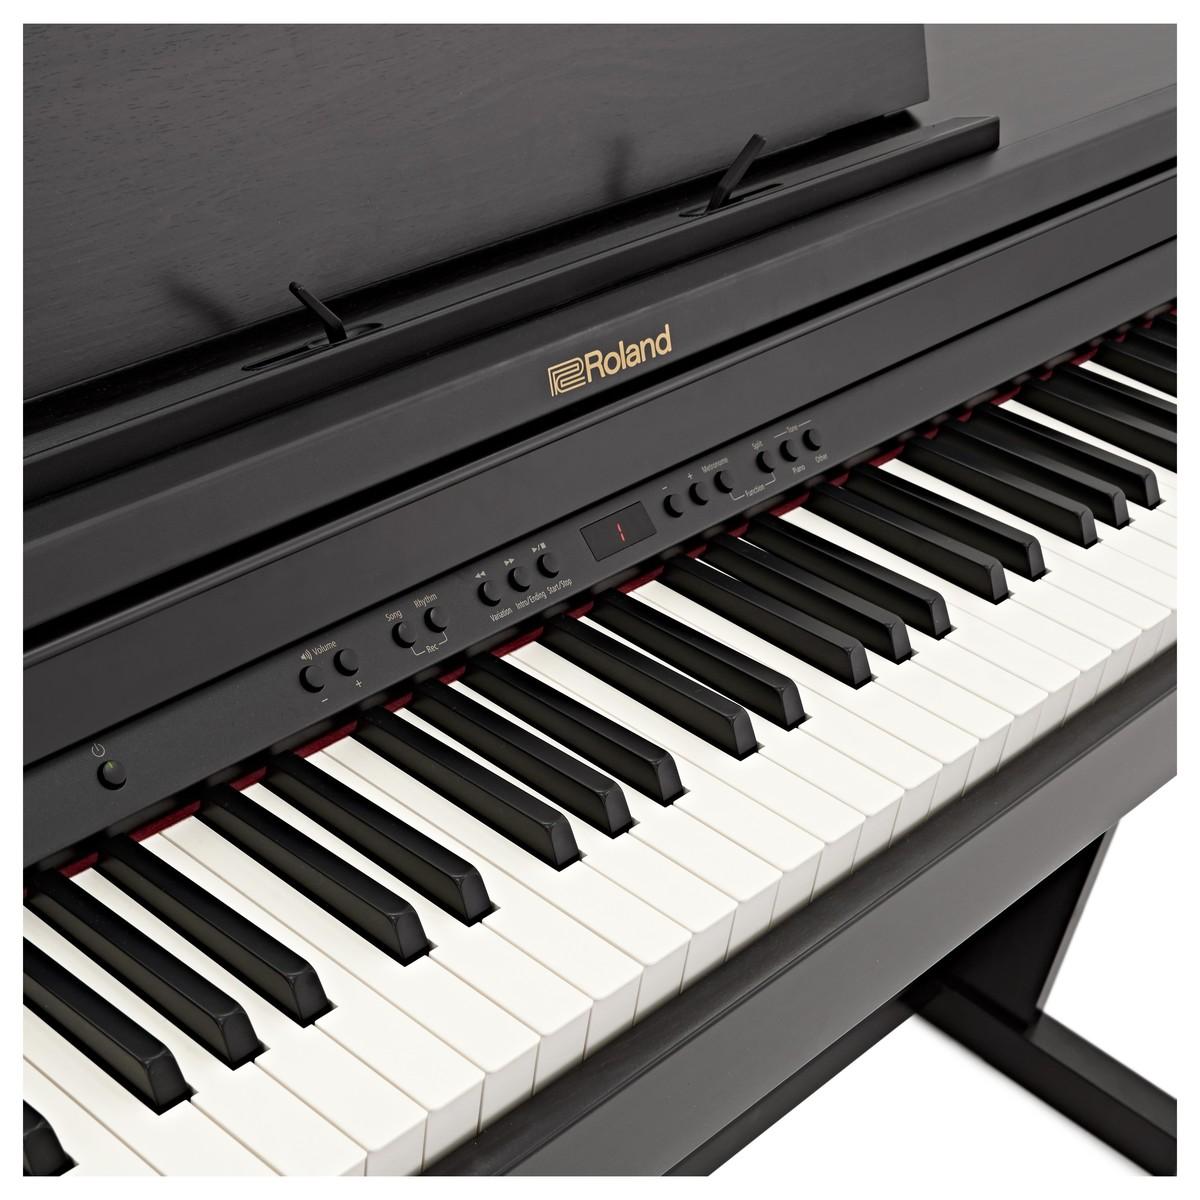 roland rp501r digital piano contemporary black at gear4music. Black Bedroom Furniture Sets. Home Design Ideas